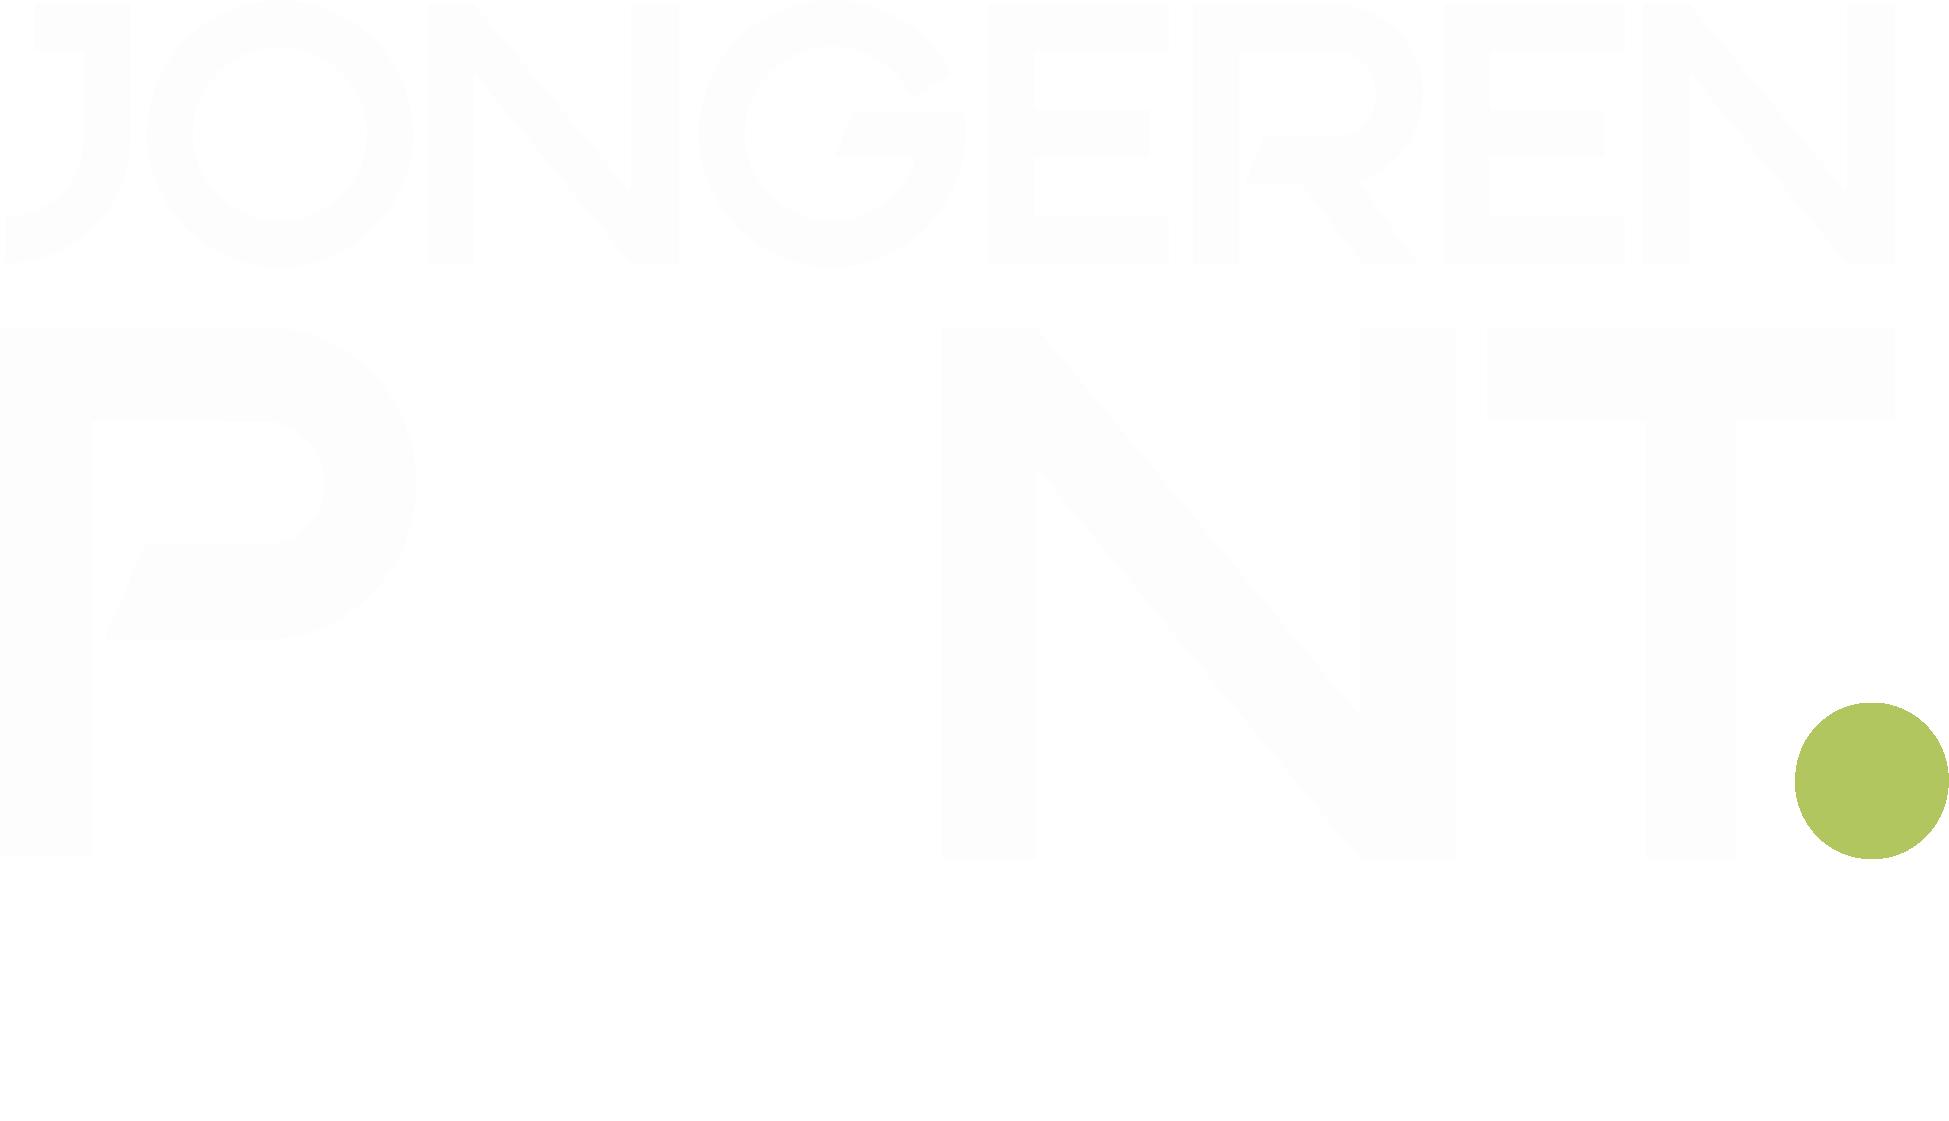 WitteTekst_Logo_JongerenPunt_2018_RGB (1)